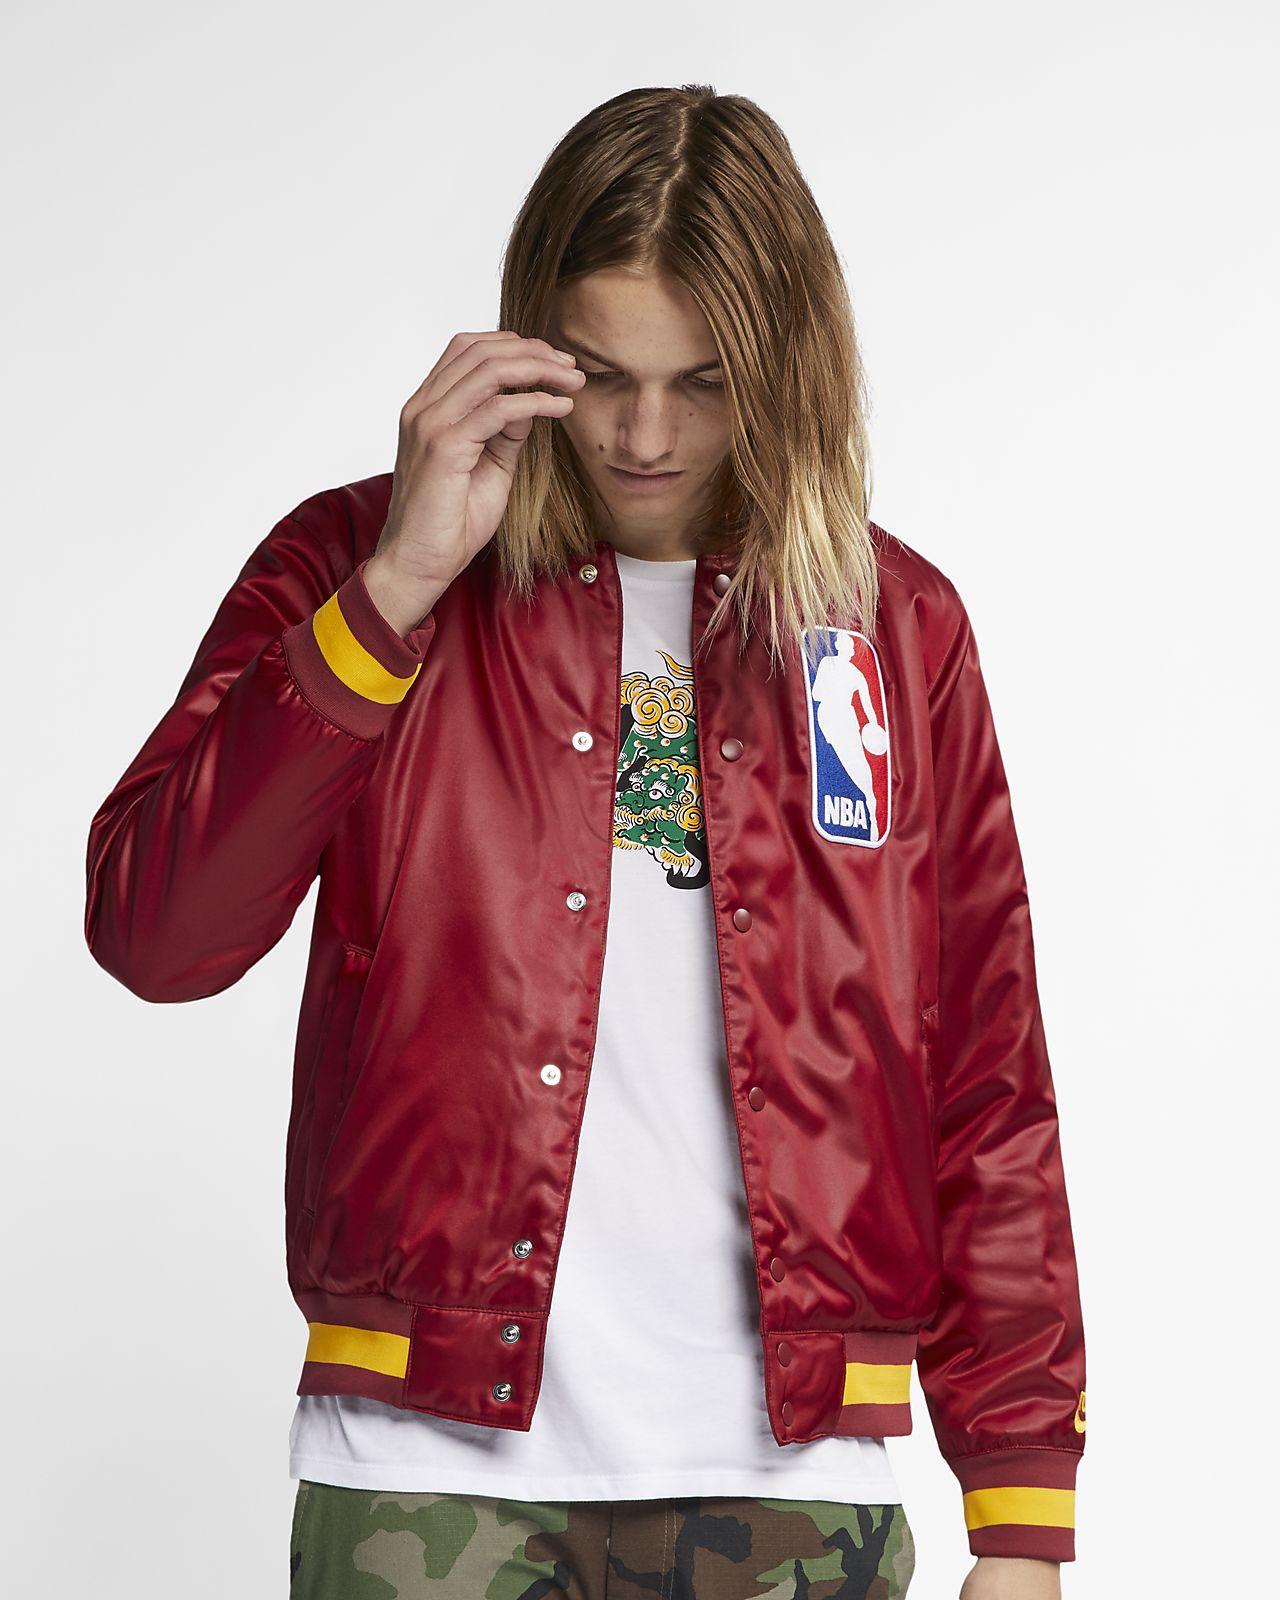 Nike SB x NBA Men's Bomber Jacket